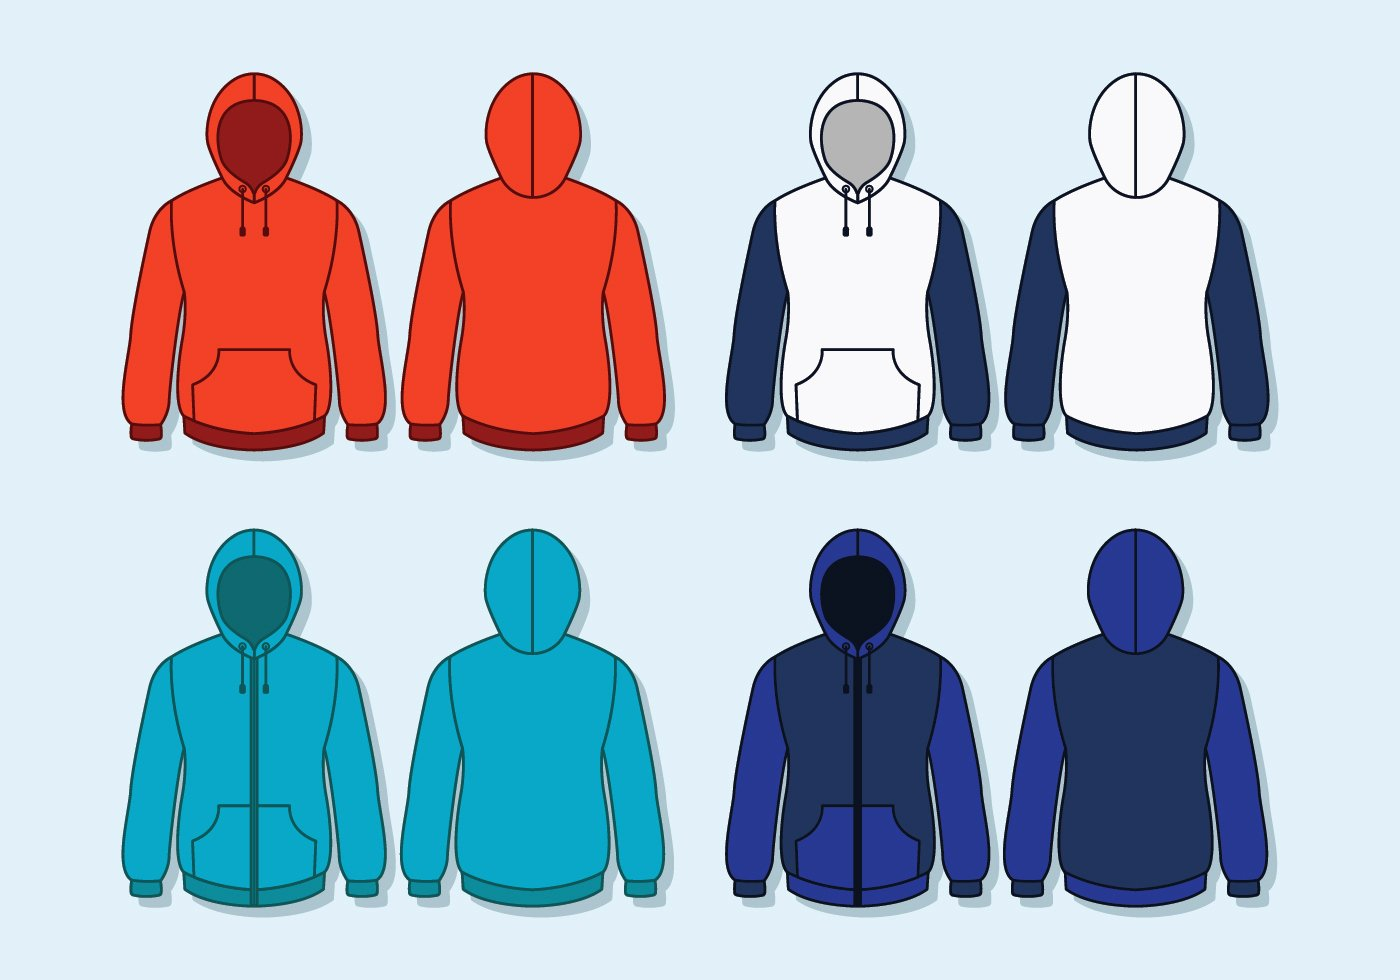 Hooded Sweatshirt Template Unique Capuz Free Vector Art 169 Free Downloads